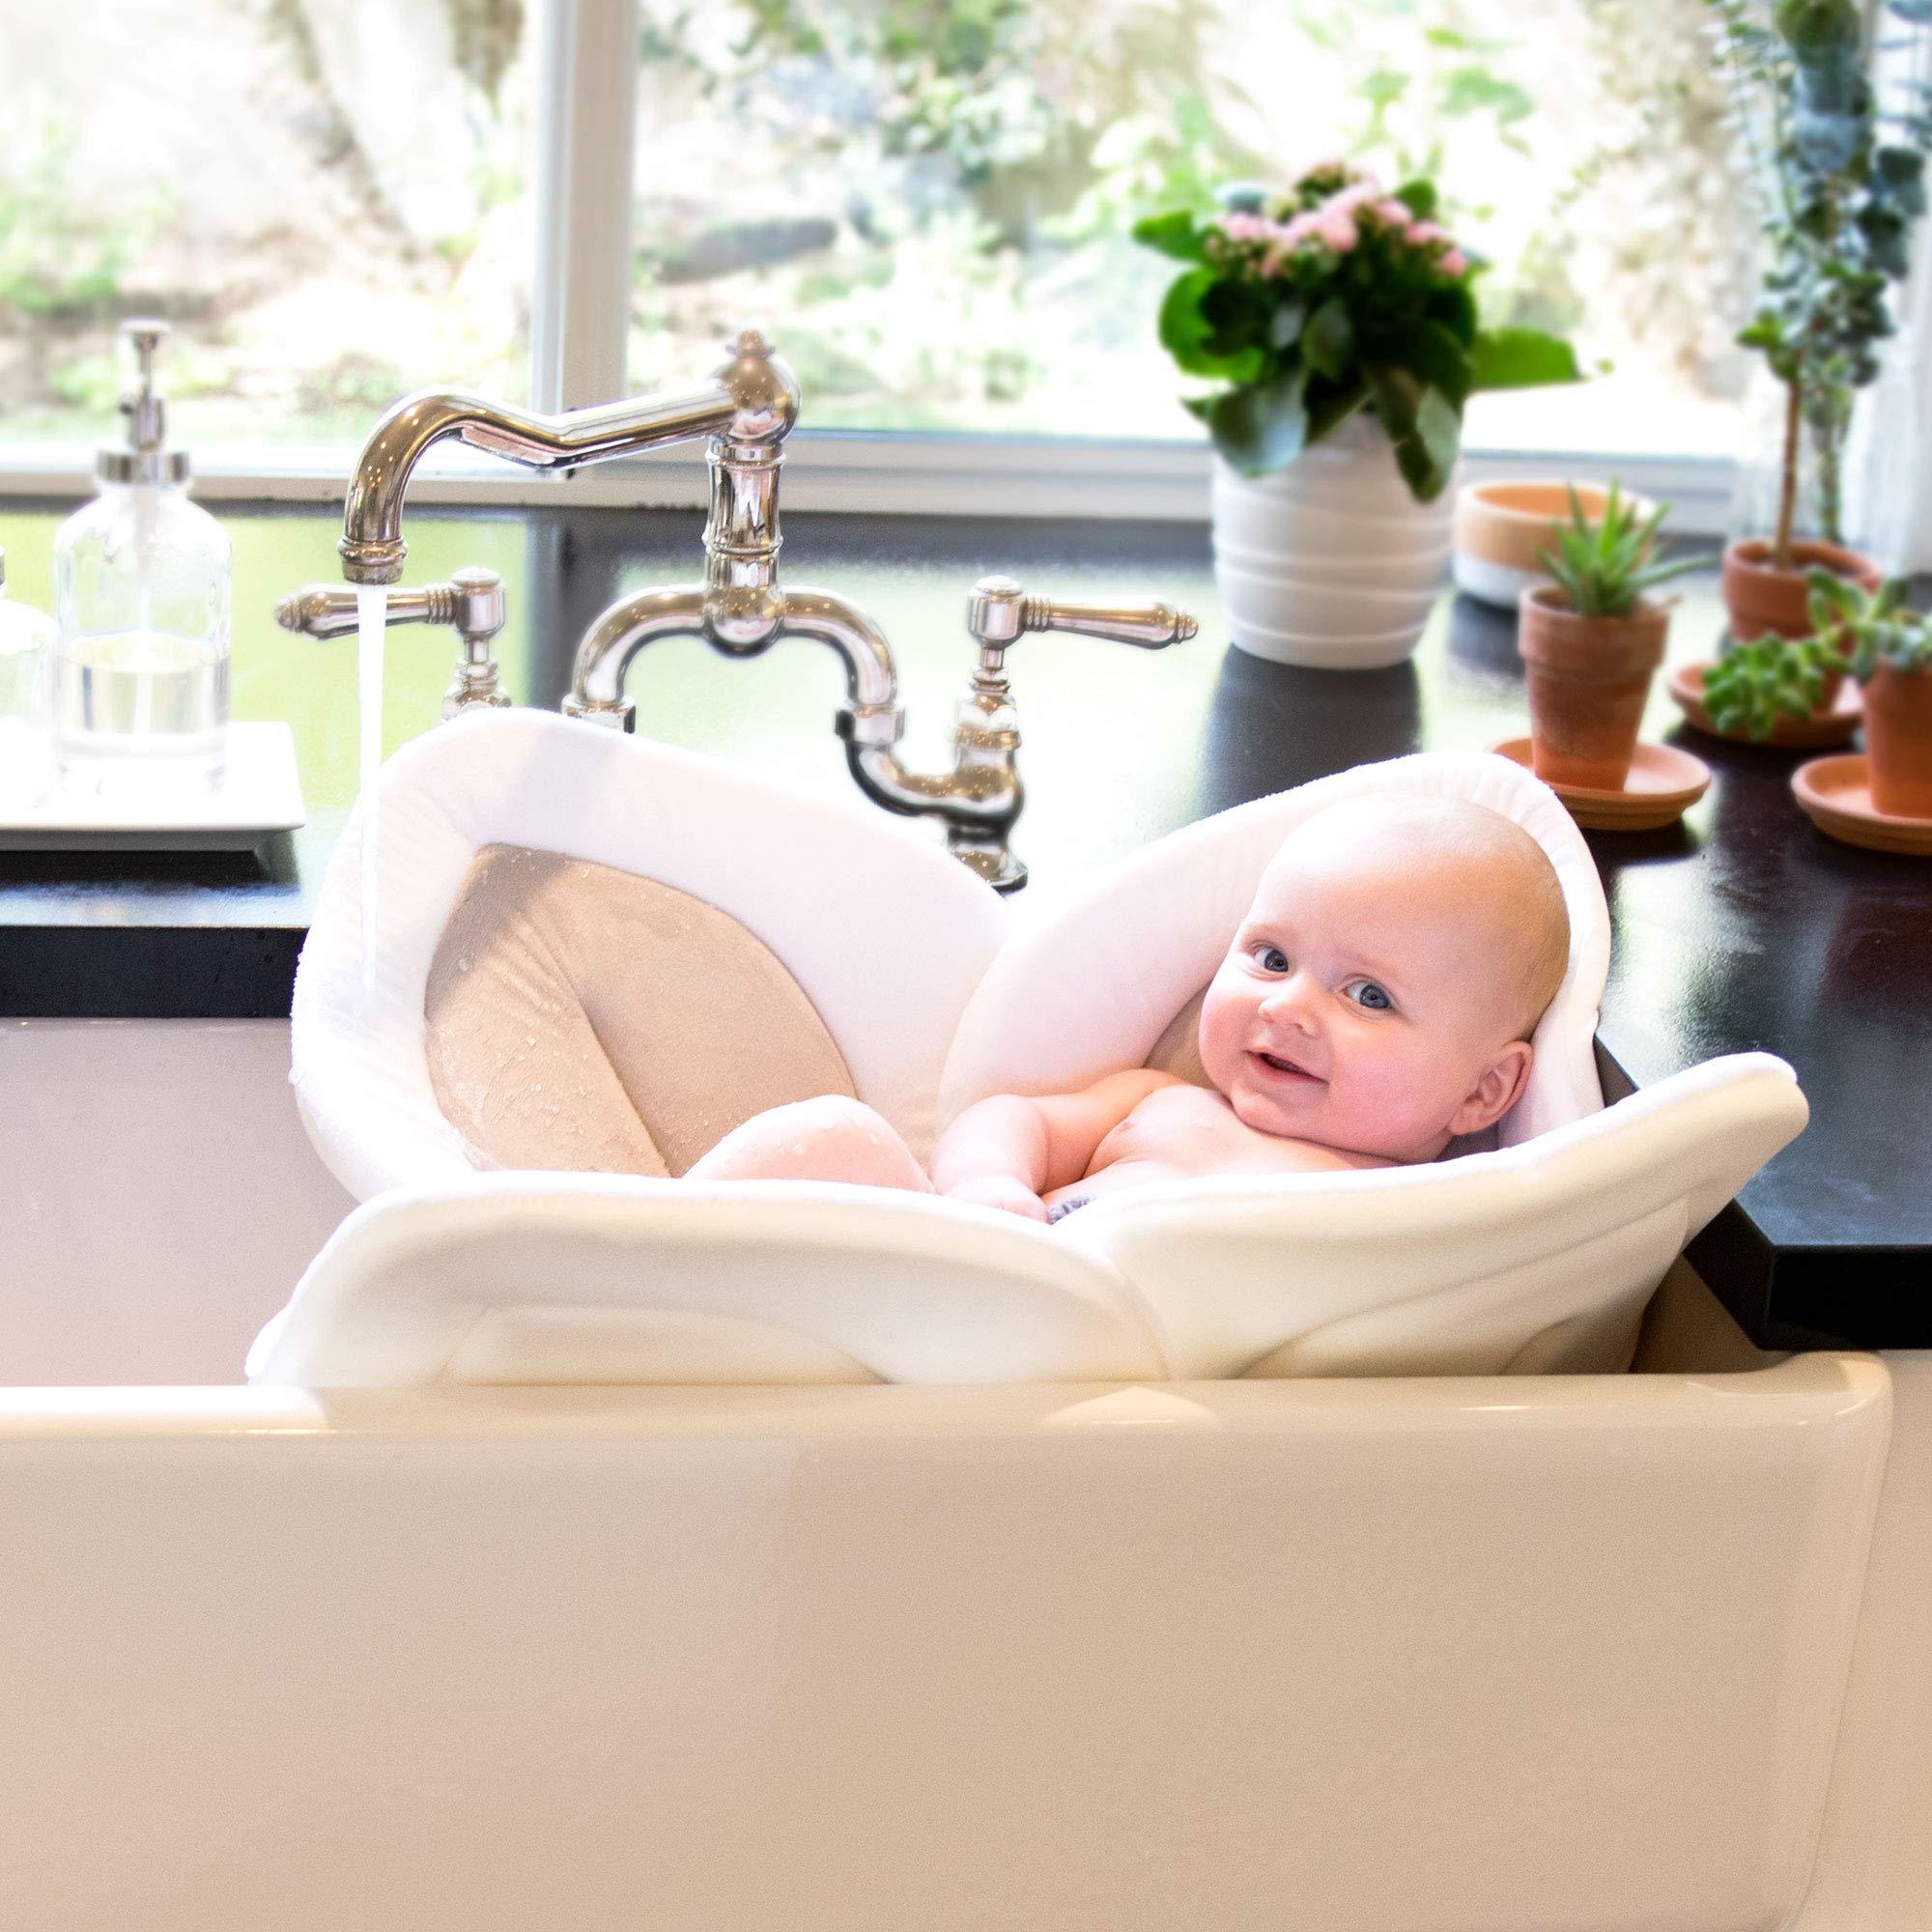 Blooming Bath Lotus - Baby Bath (Gray/Dark Gray) by Blooming Bath (Image #6)